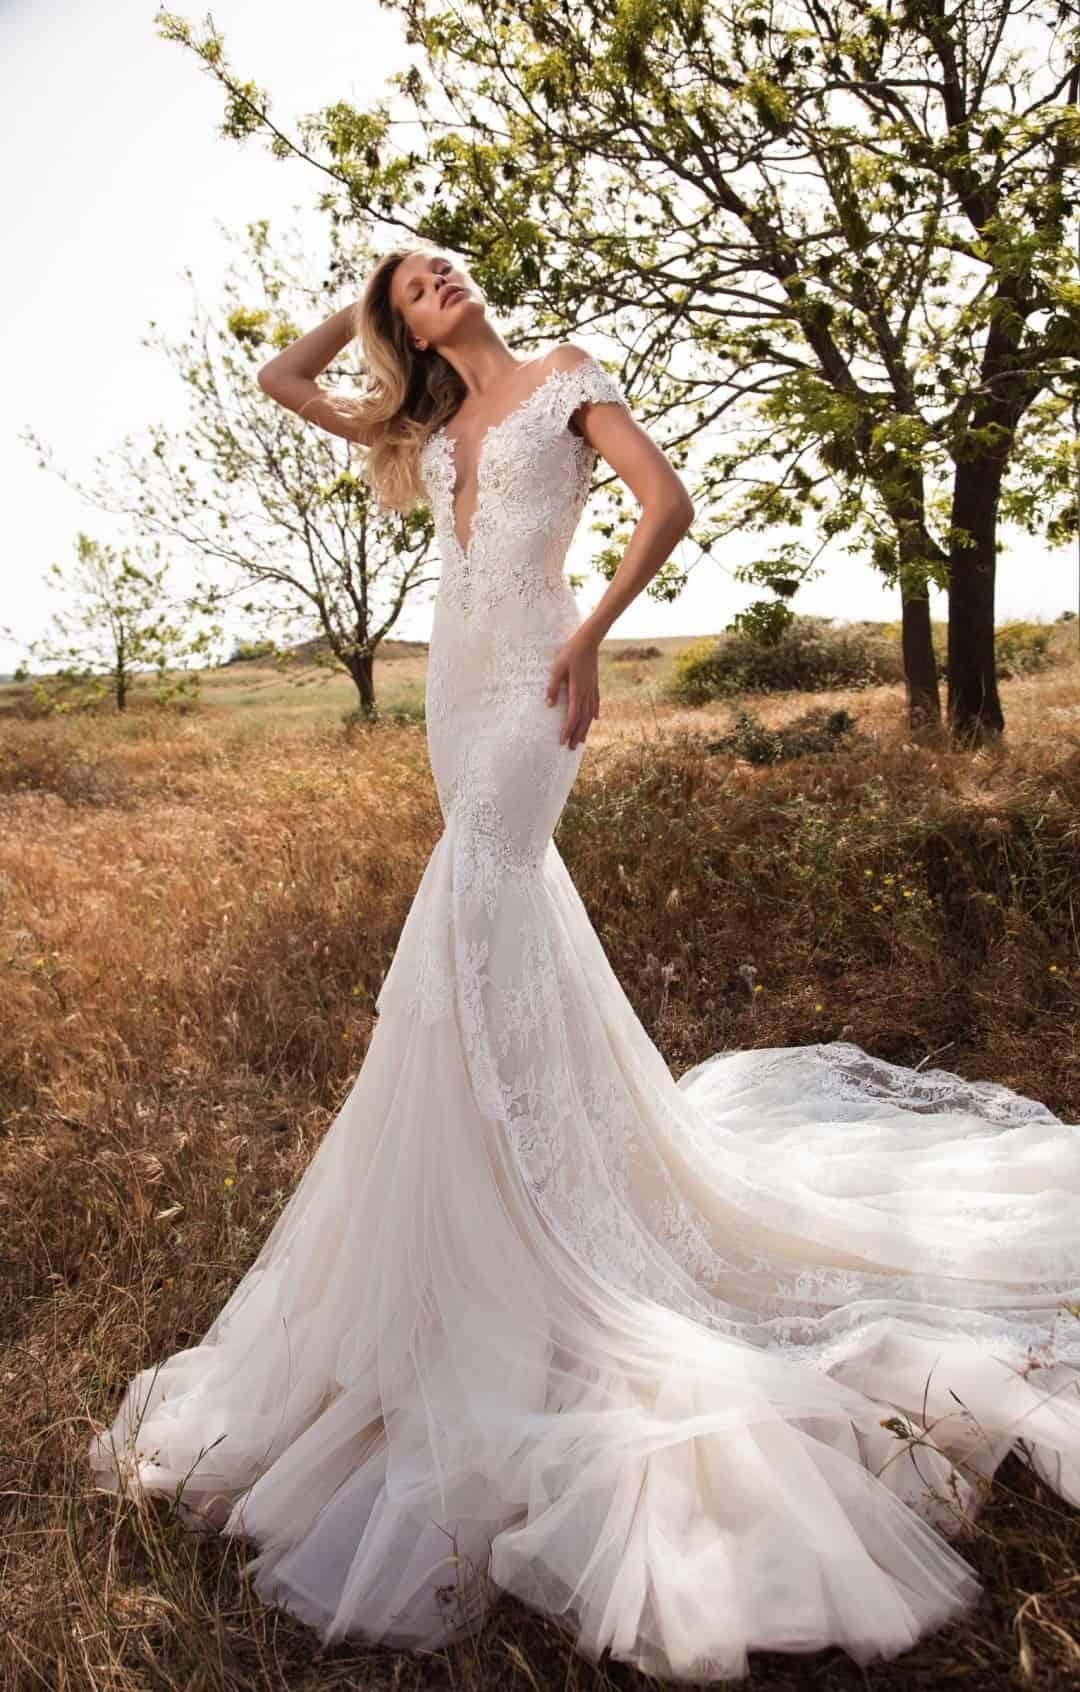 Haute Couture Brautkleider - GALA-702